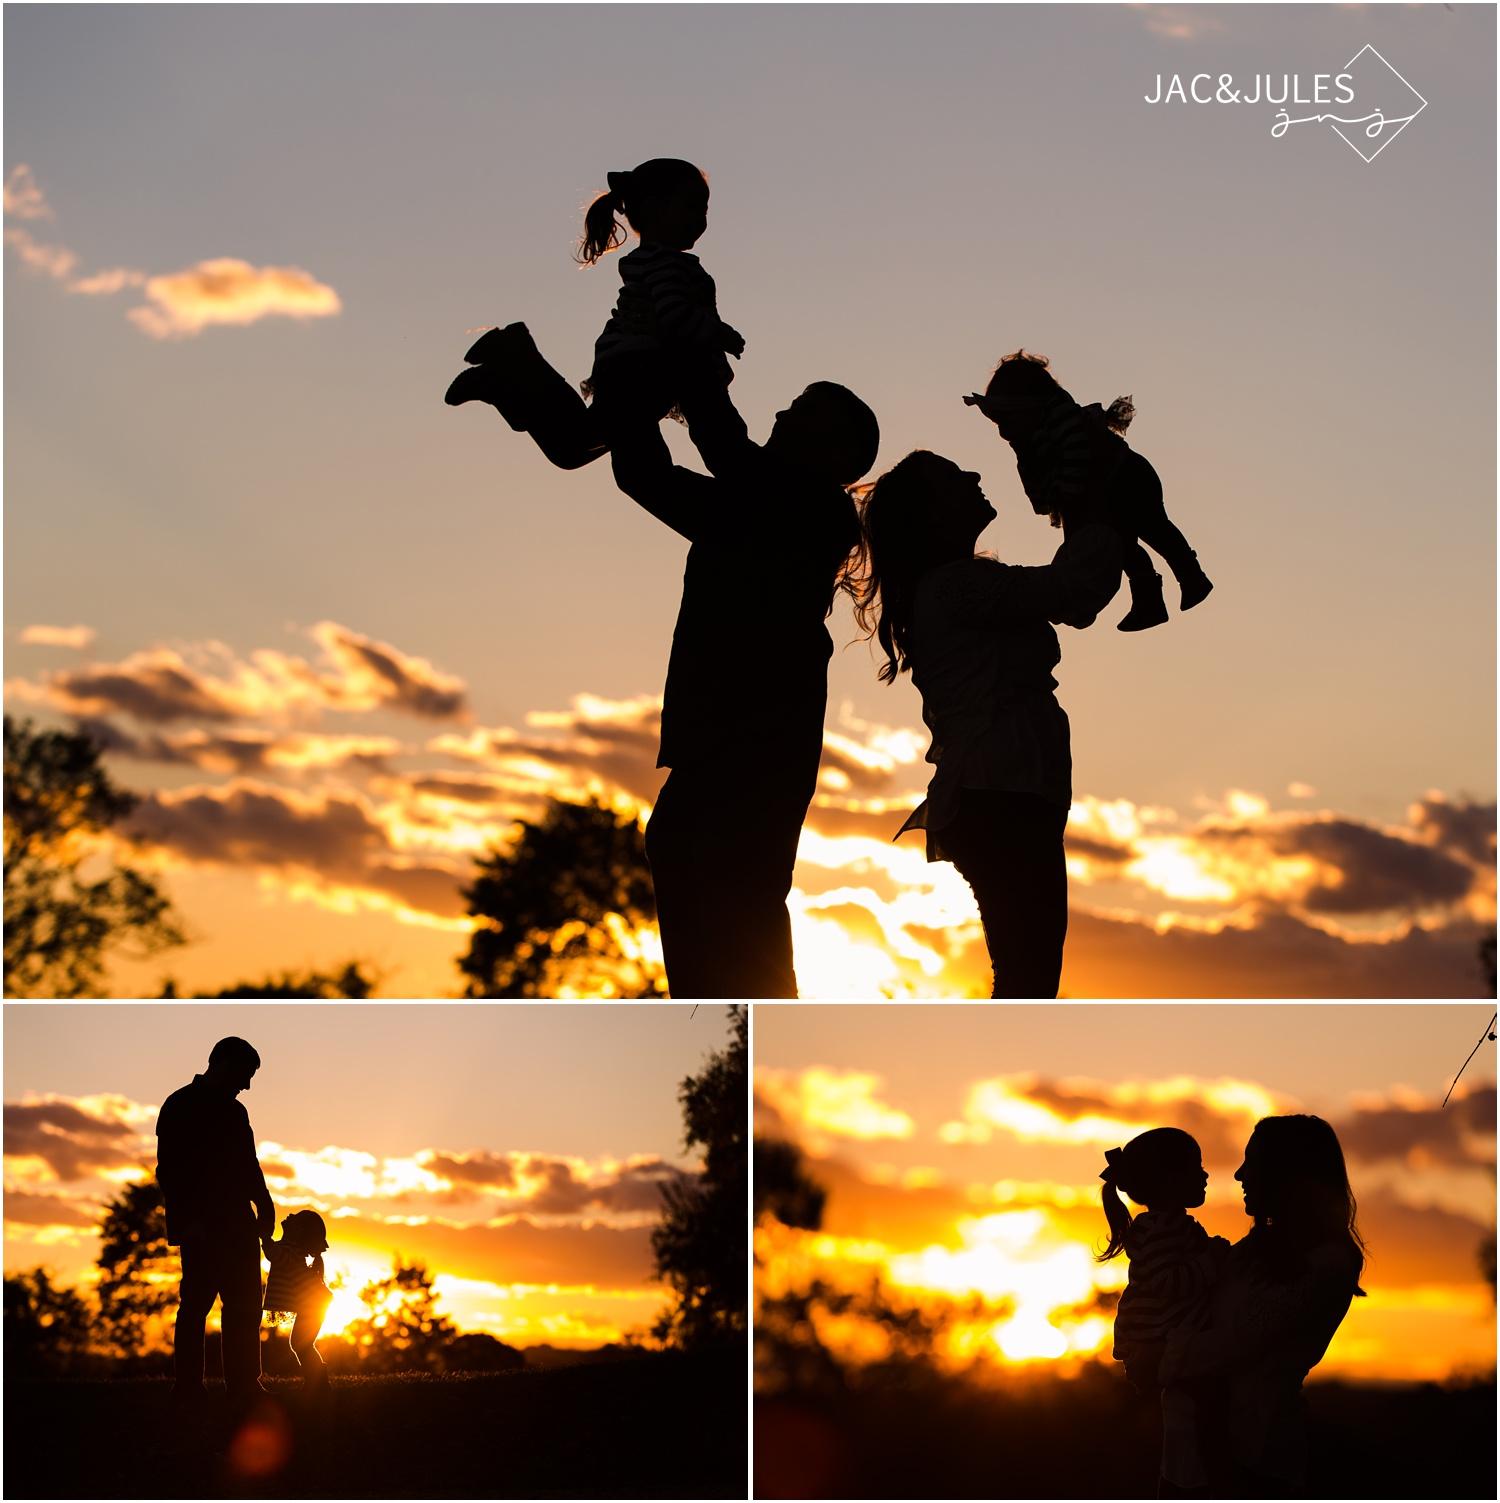 family silhouette photos at bayonet farm in holmdel, nj.